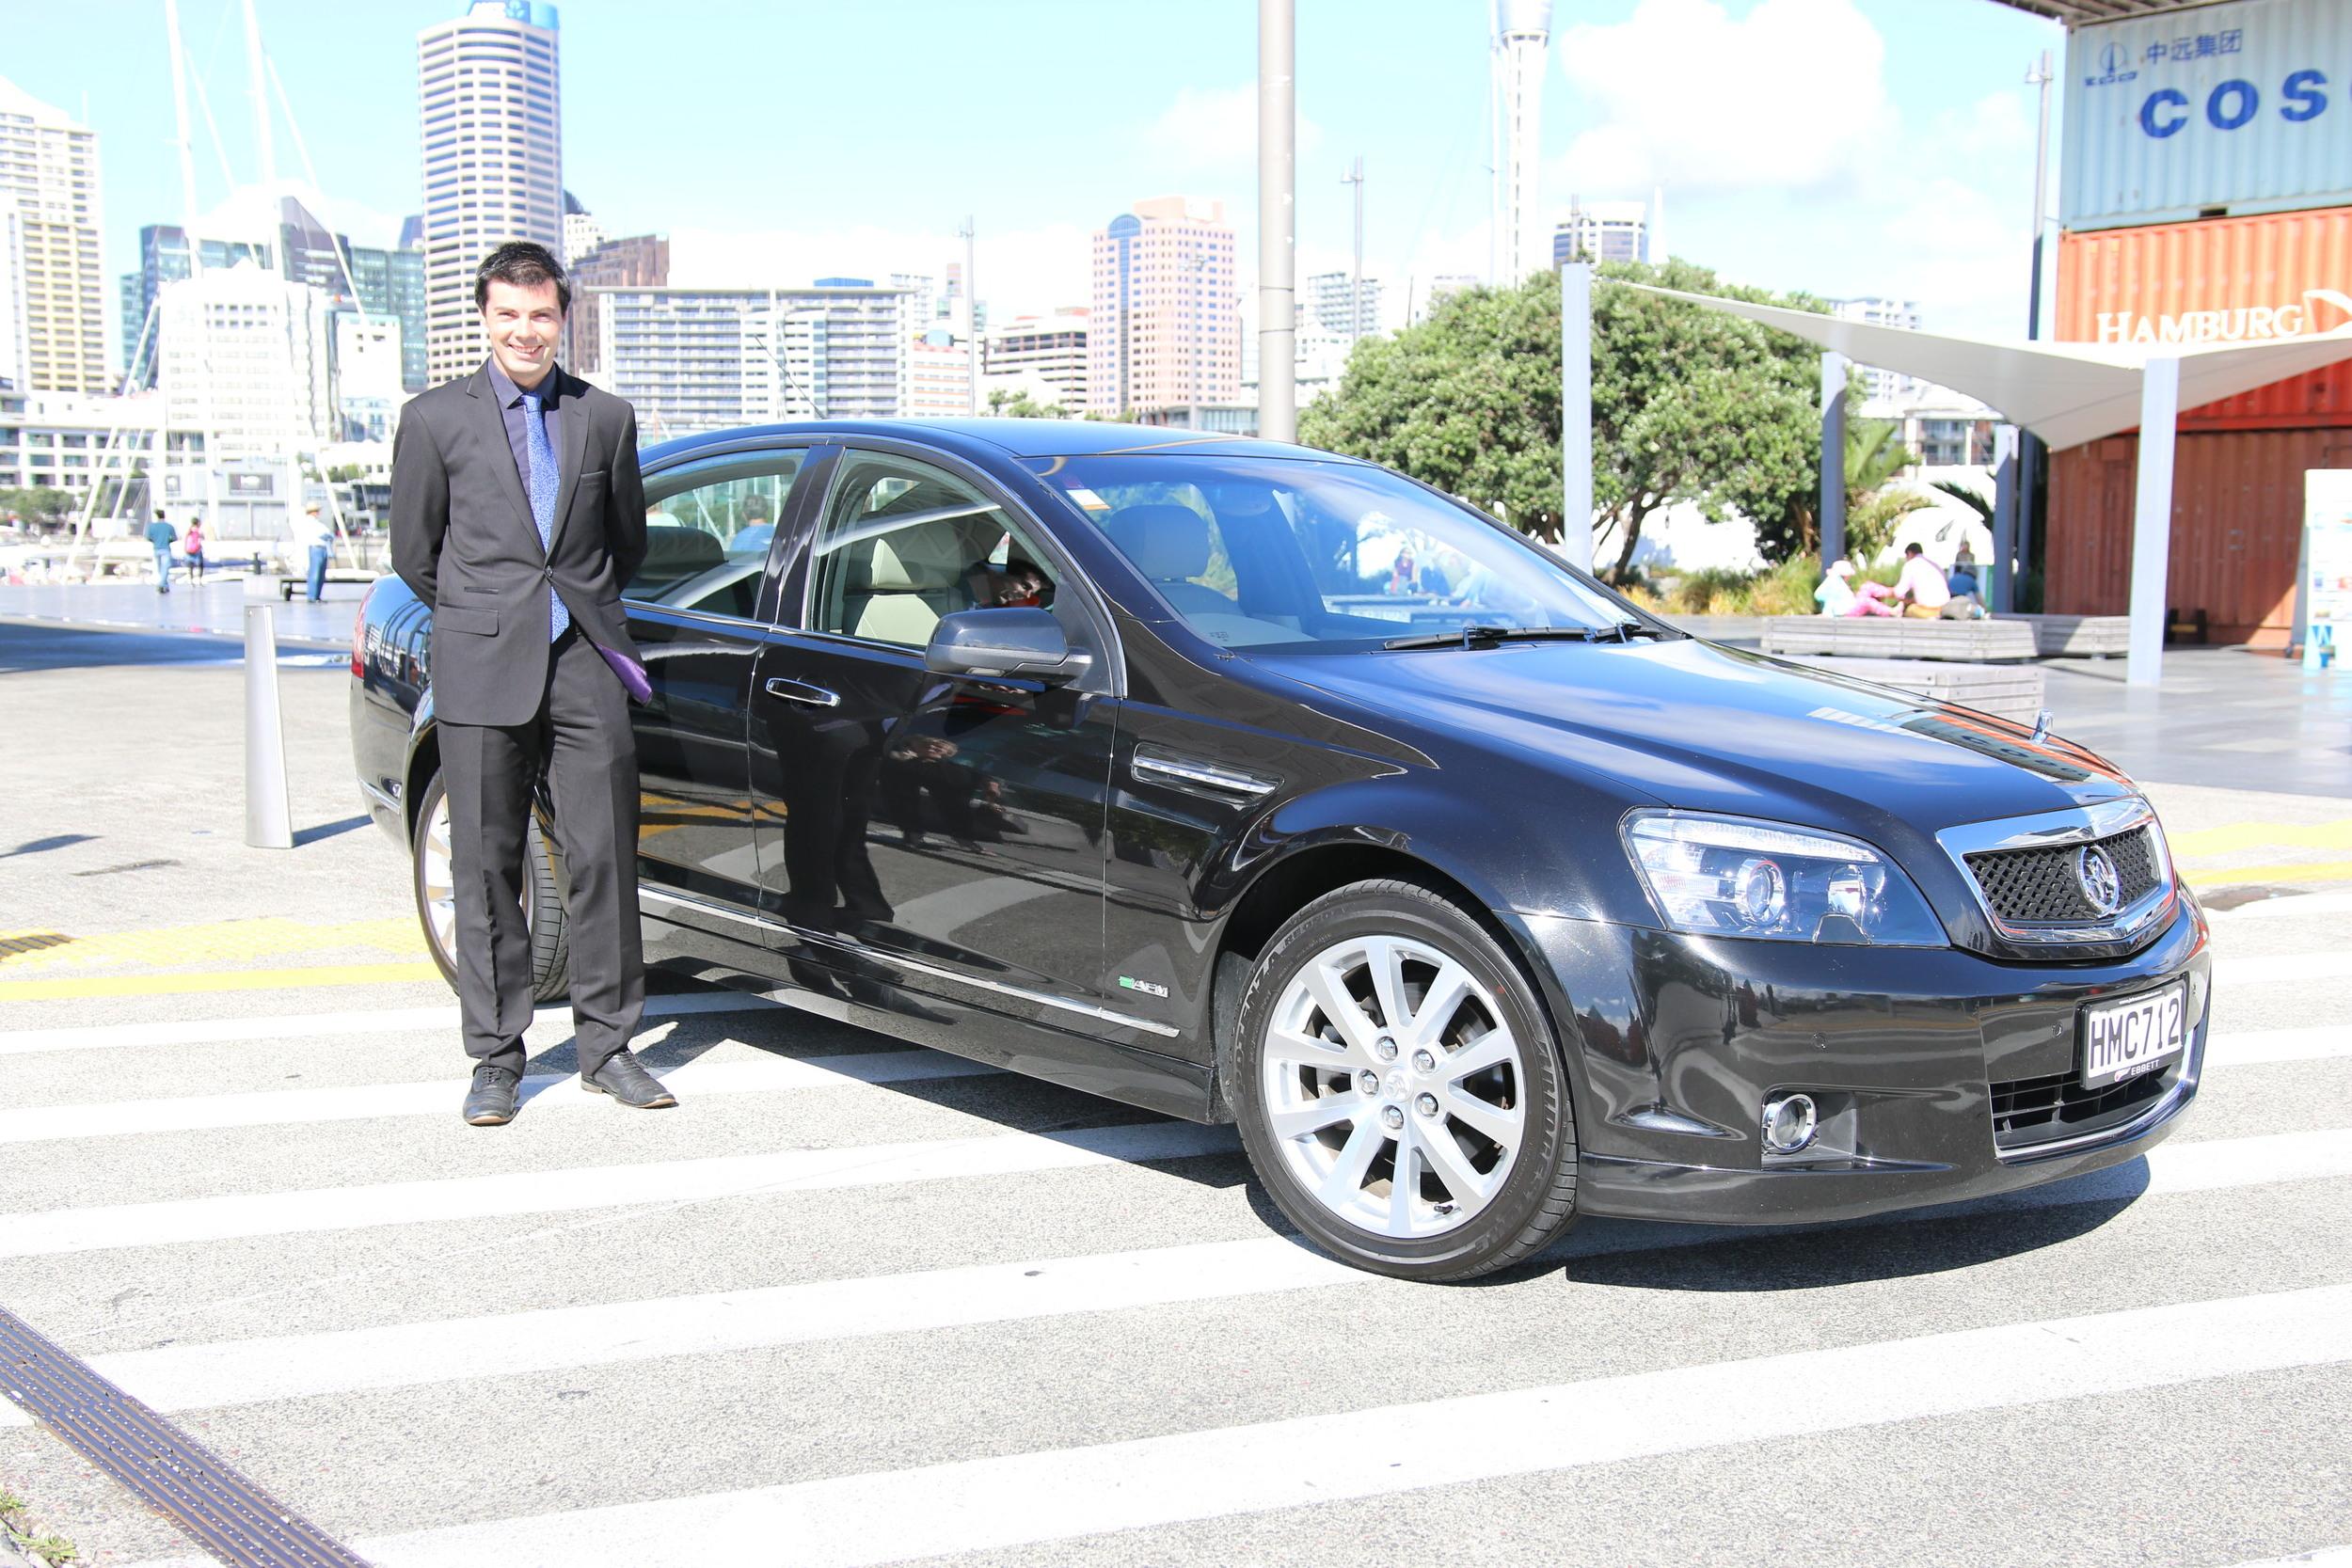 Ezy Driver - Caprice Limousine.JPG